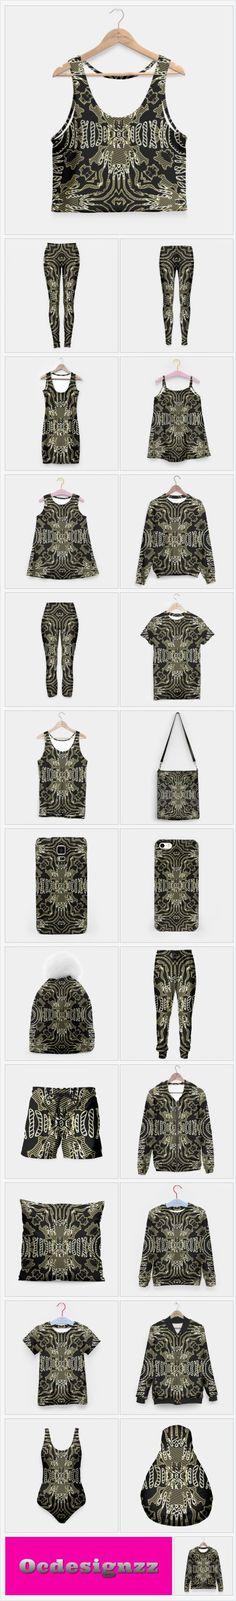 Golden Zebra Print Tribal Fashion Collection!  📸 Shop Our Instagram Pinned  🚨Direct Link 🚨  https://liveheroes.com/en/product/show/514029 #fashion #shopping #kidsclothing #womensfashion #mensfashion #yogapants #fitnesswear #totebag #liveheroes #ocdesignzz https://liveheroes.com/en/product/show/514029